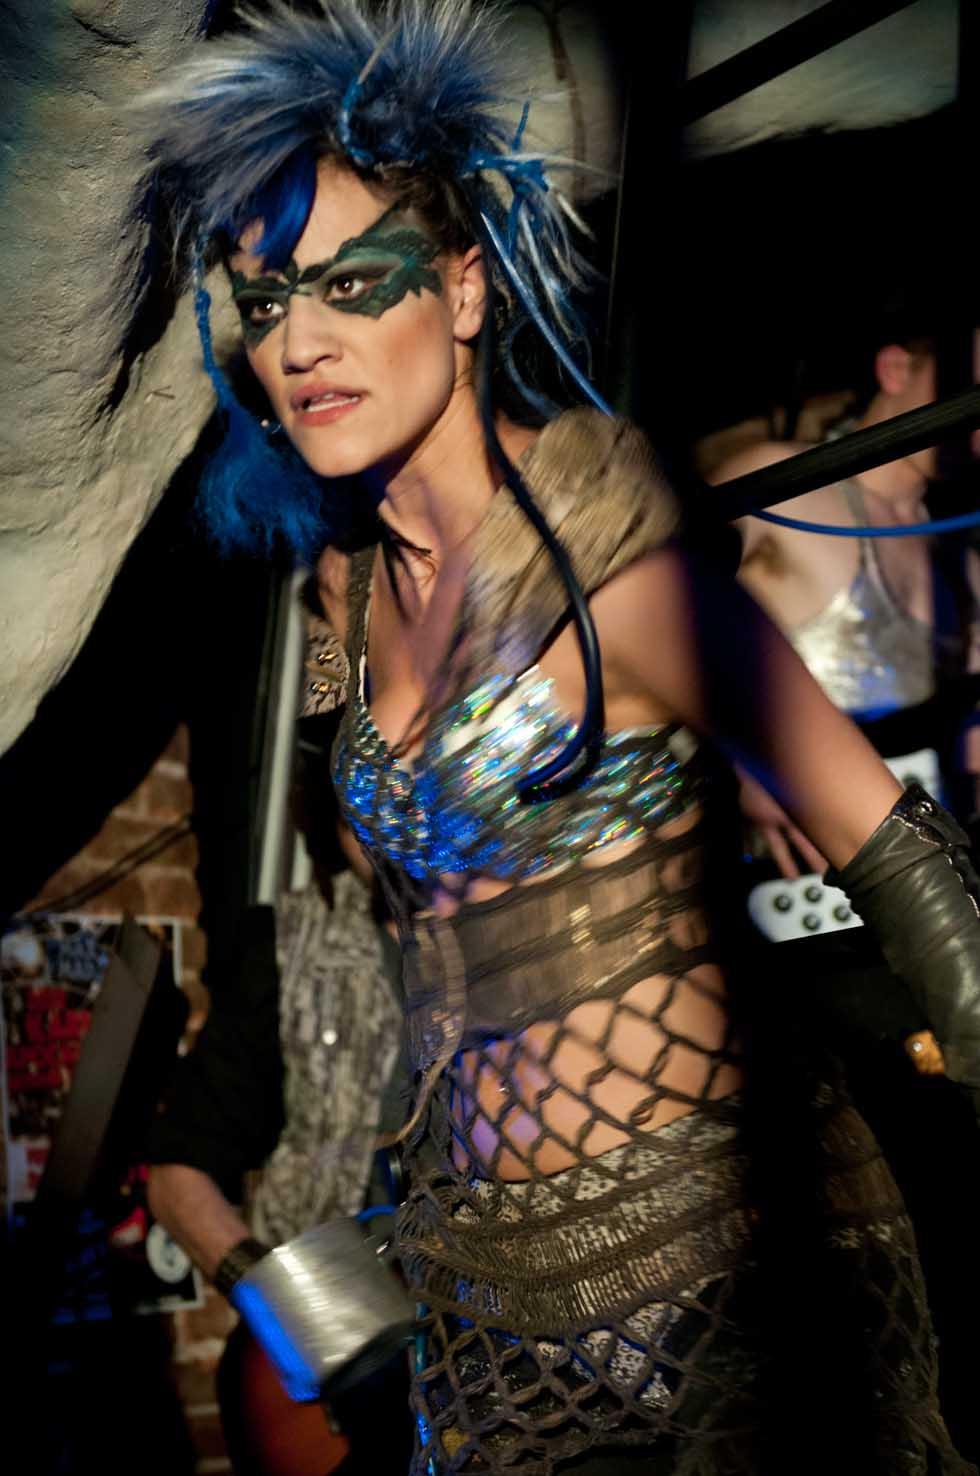 zum-schneider-nyc-2012-karneval-apocalyptika-4943.jpg